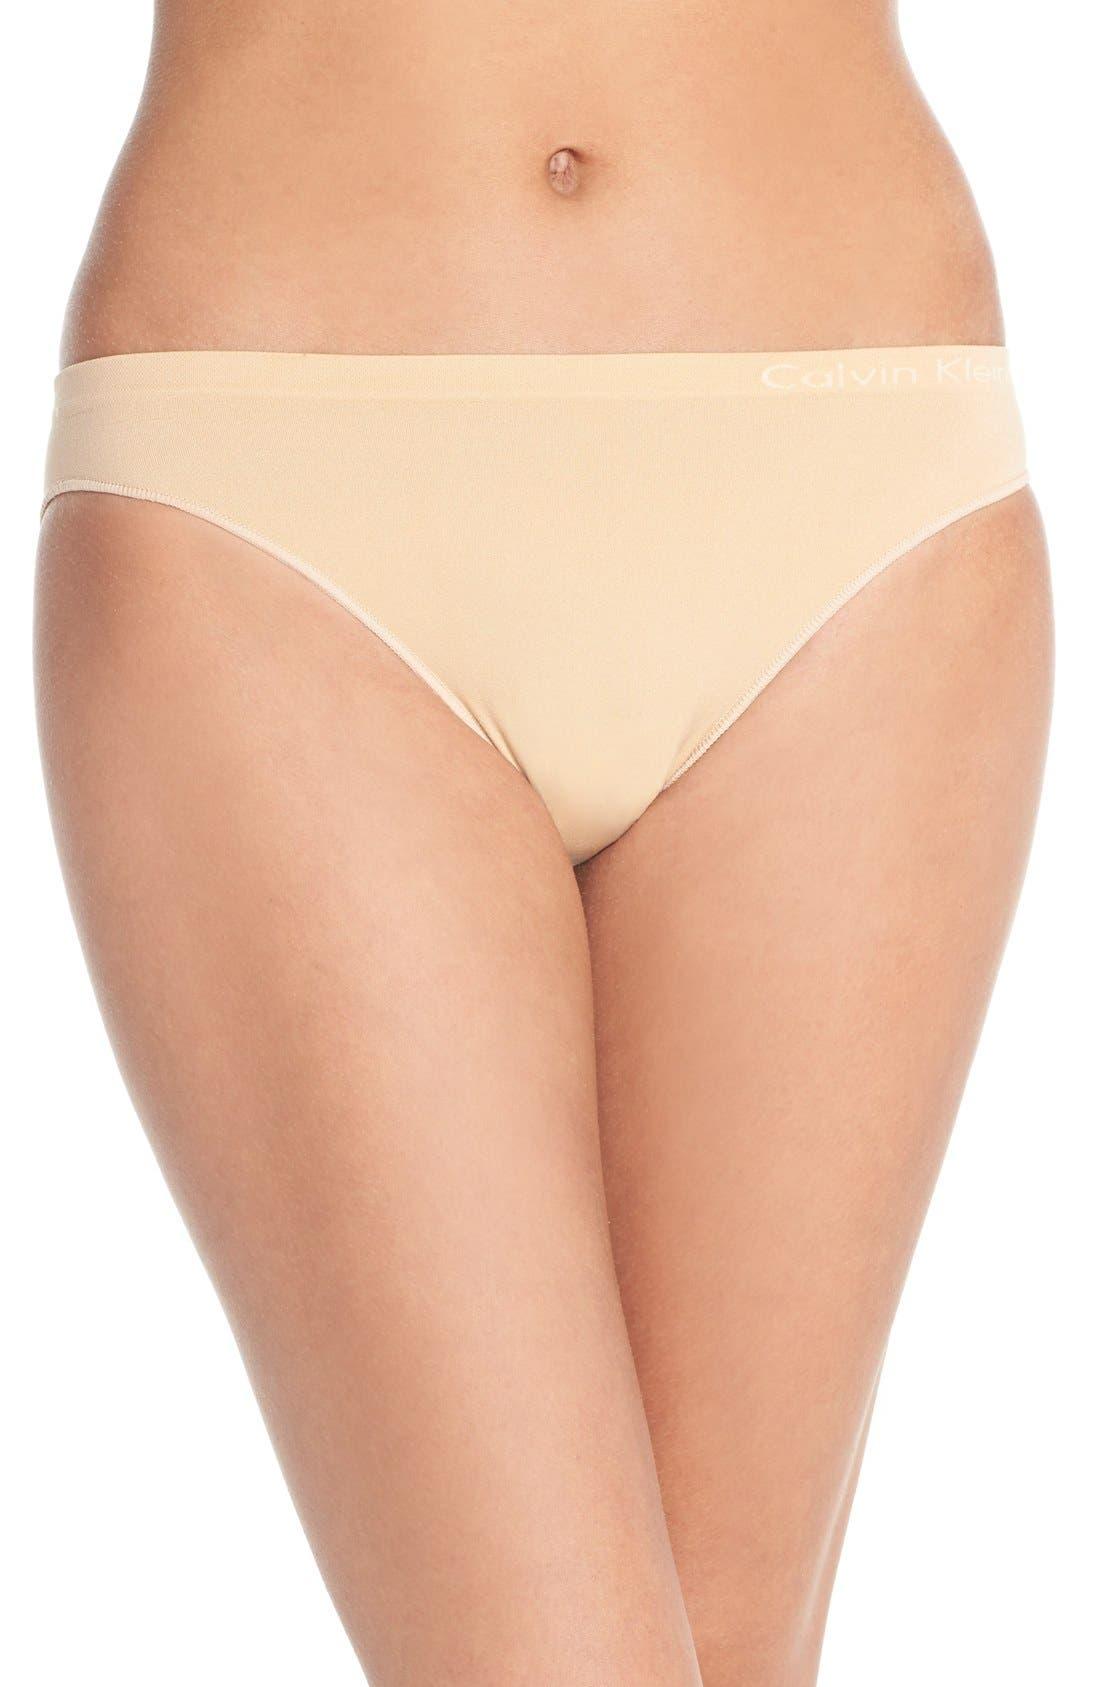 Alternate Image 1 Selected - Calvin Klein 'Pure' Seamless Bikini (3 for $33)